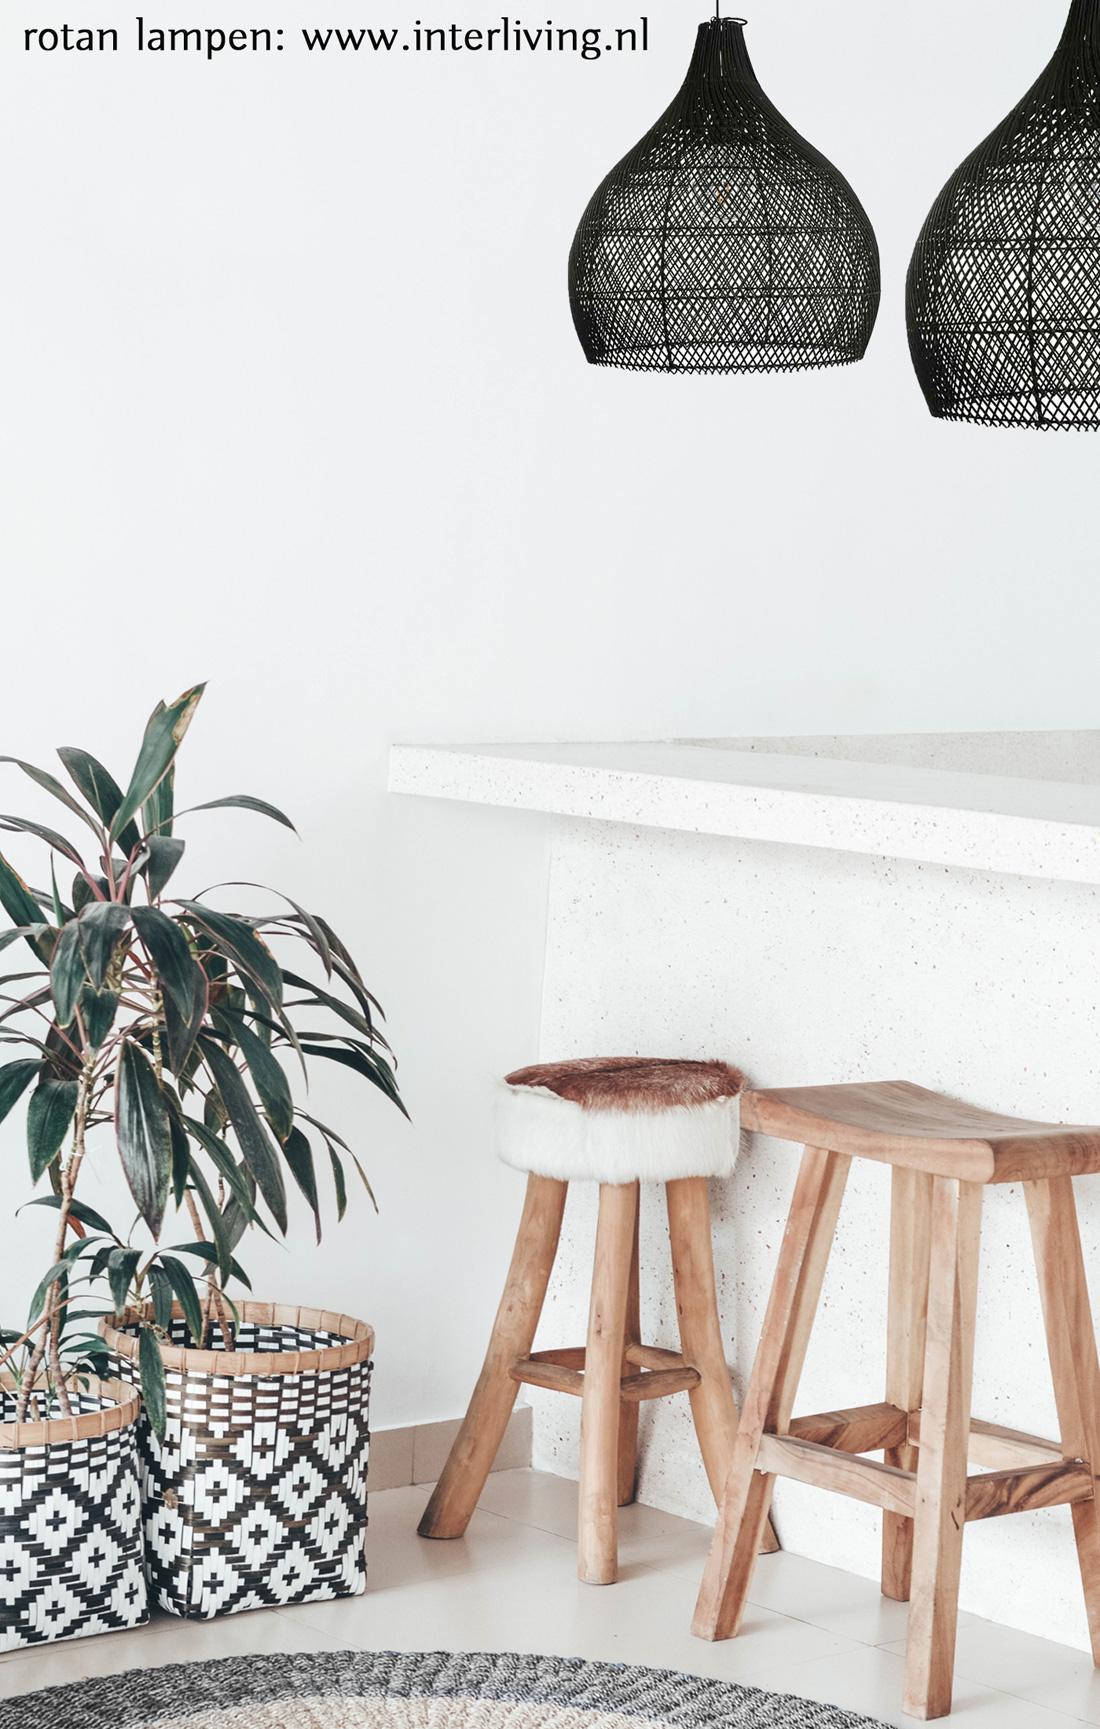 Zwart gevlochten rotan hanglamp - eco styling bali - duurzaam rotanpalm